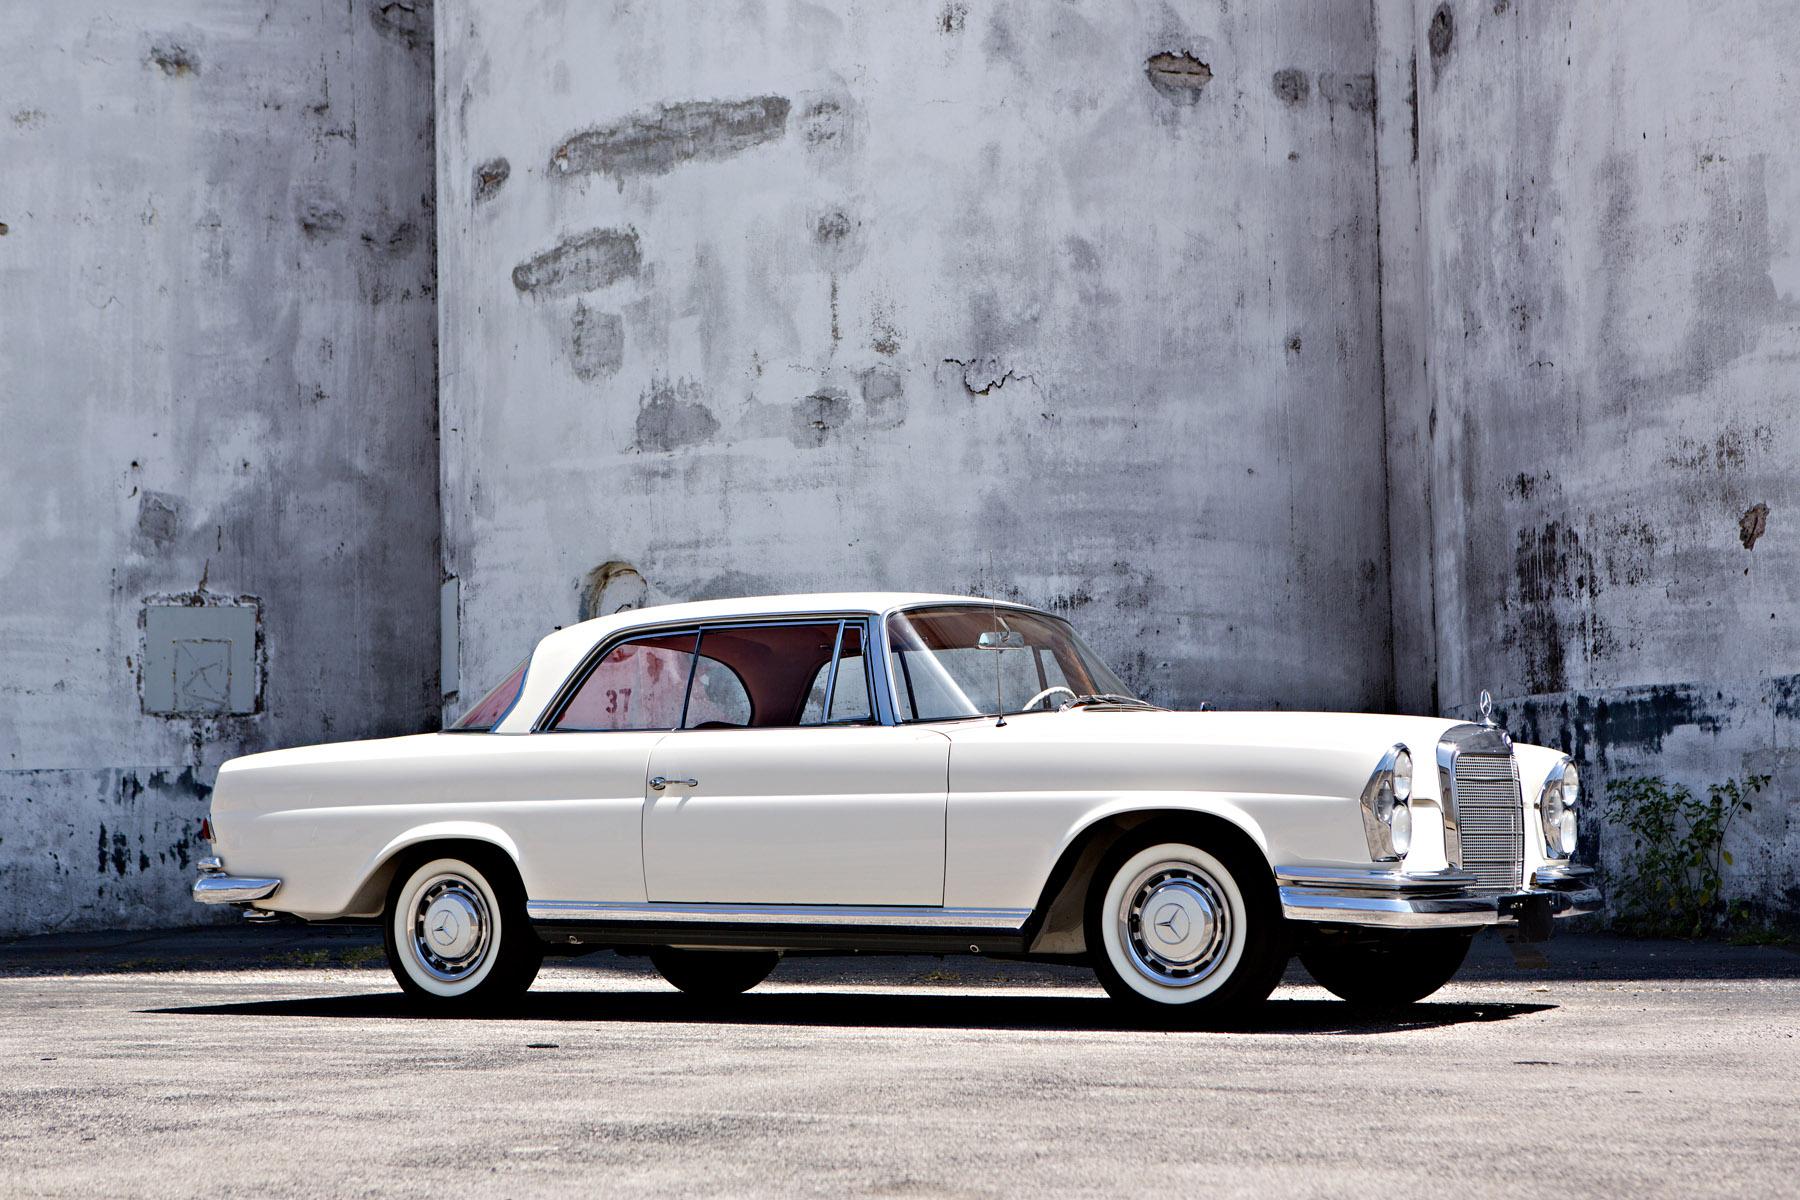 At Gooding & Company, 1961 Mercedes-Benz 220 SEb Coupe (image courtesy Gooding & Company)